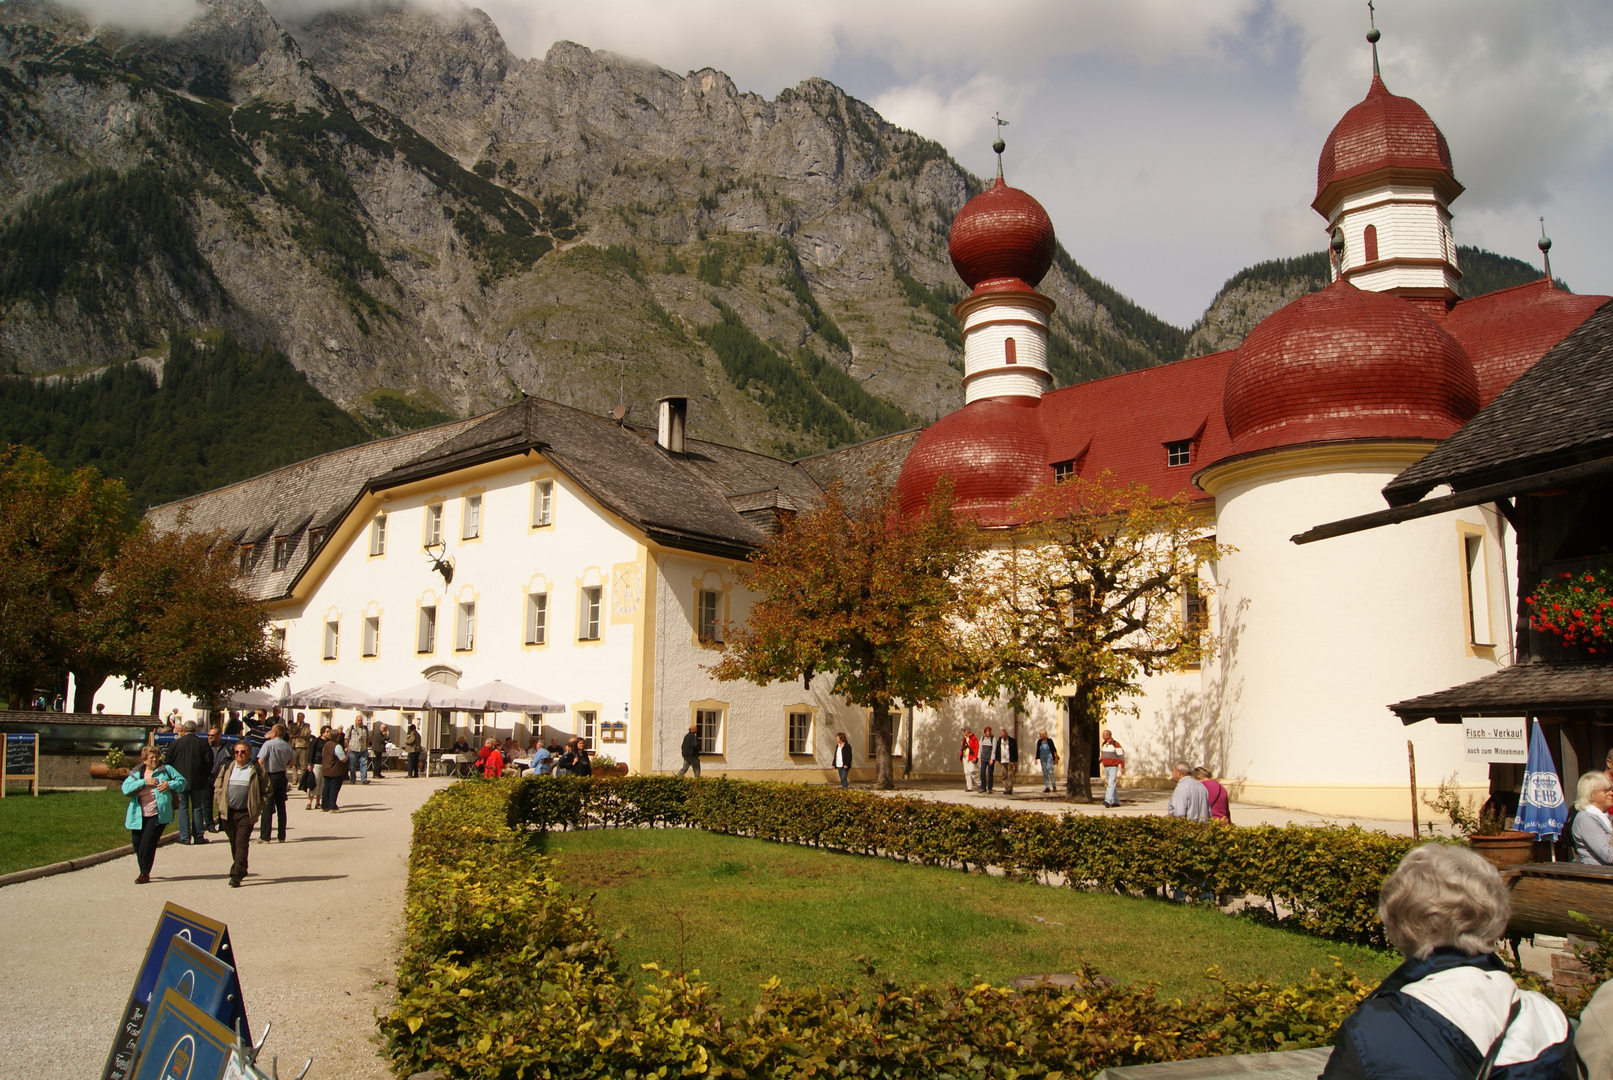 Kirche St. Bartholomä im Königssee